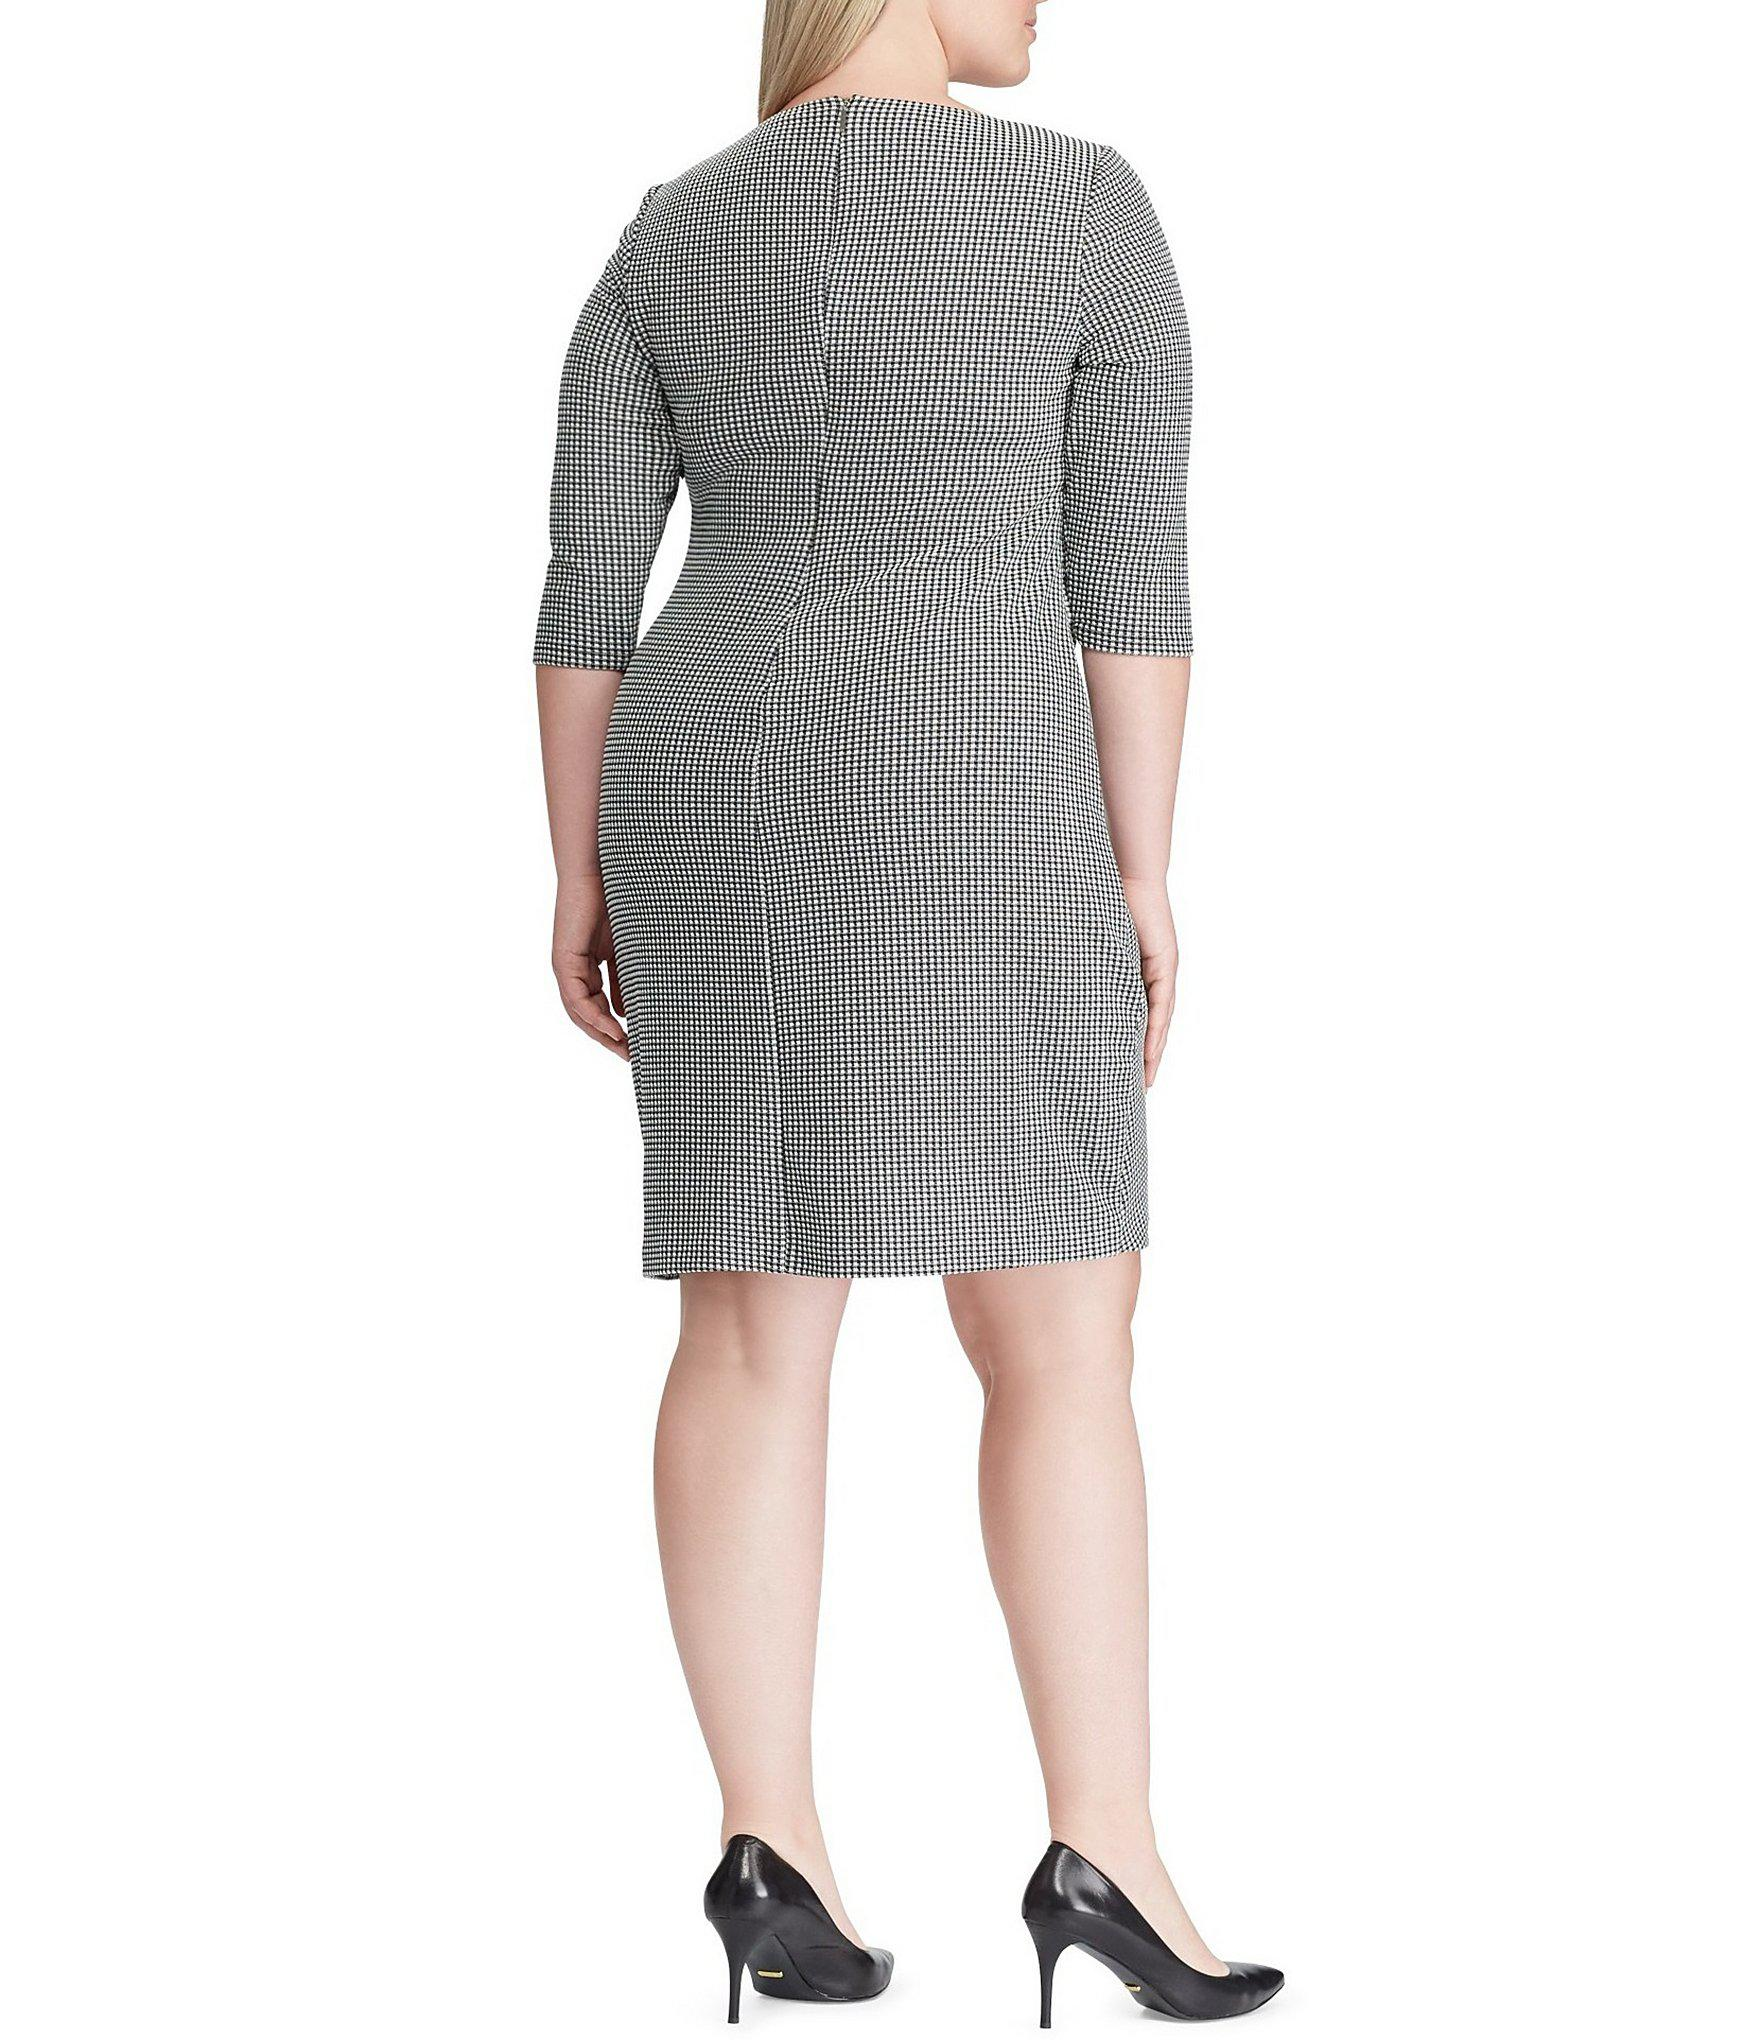 Lyst - Lauren By Ralph Lauren Plus-size Houndstooth Jacquard ...